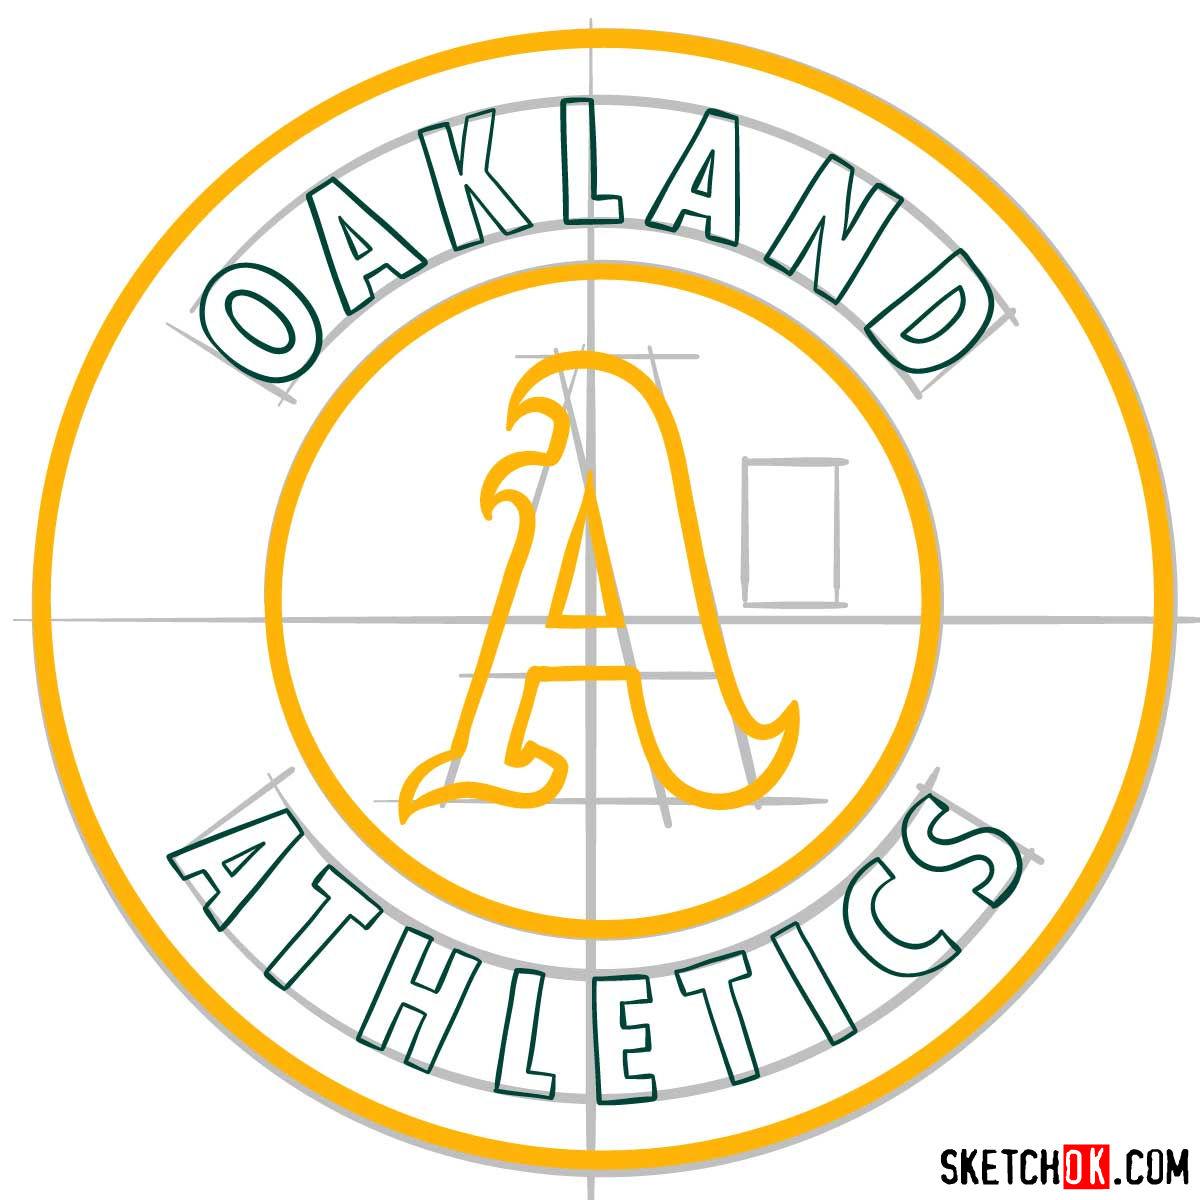 How to draw Oakland Athletics logo | MLB logos - step 08